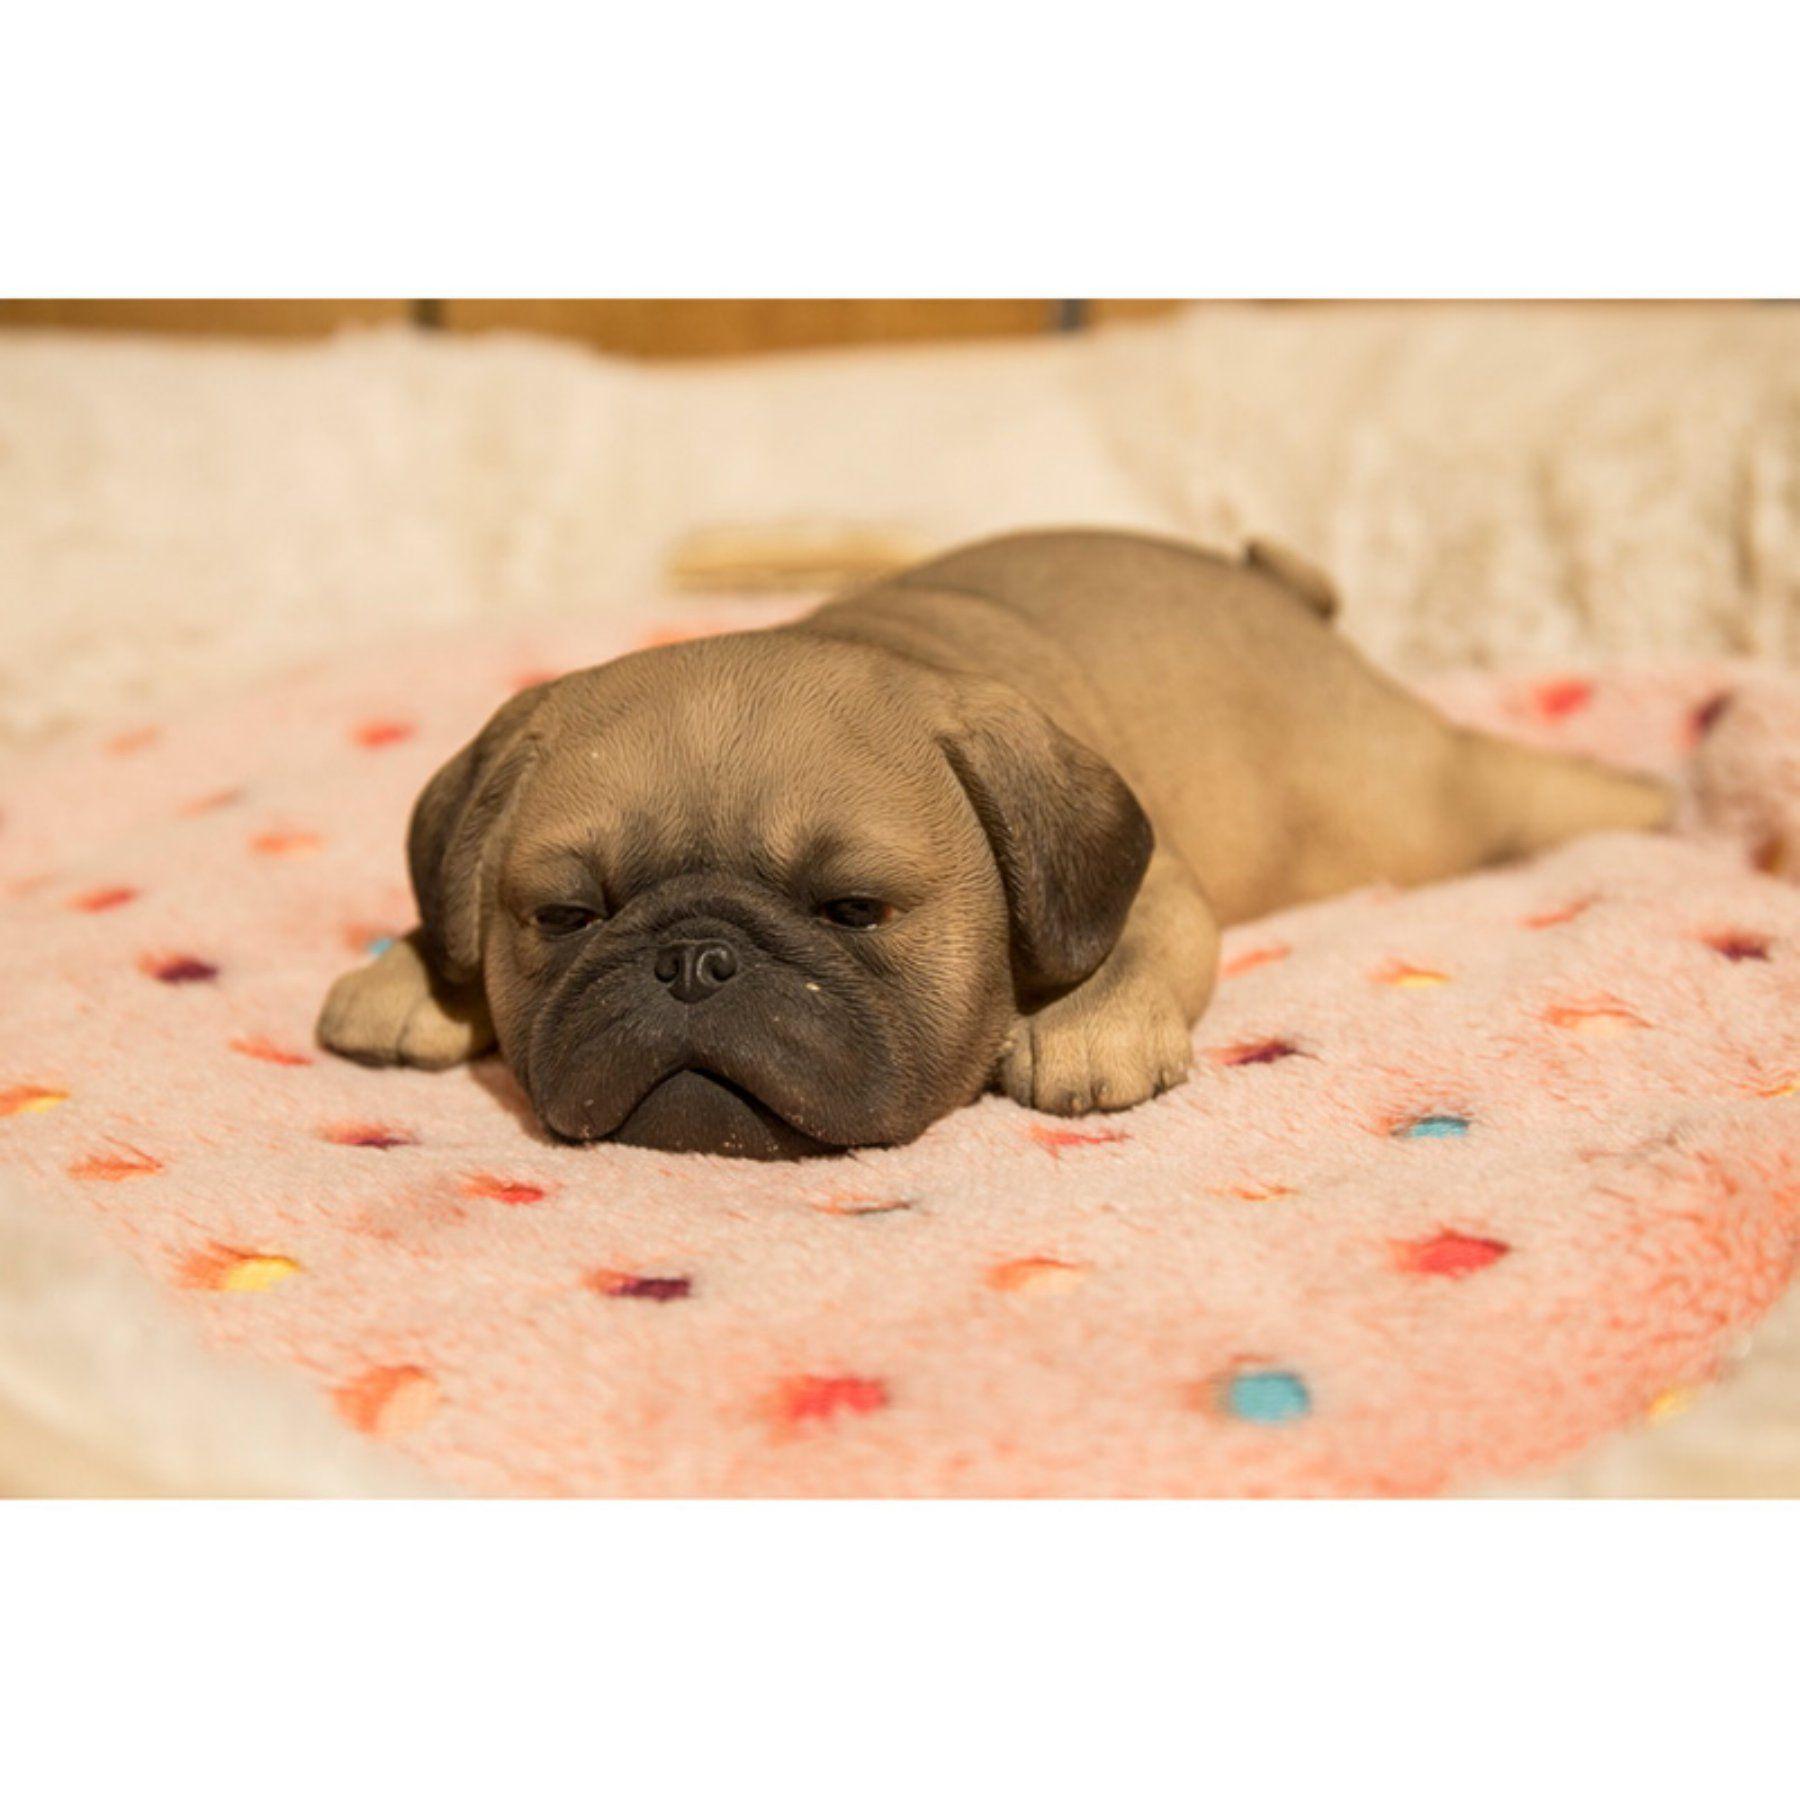 Hi Line Gift Ltd Pug Puppy Sleeping Sleeping Puppies Puppies Pugs